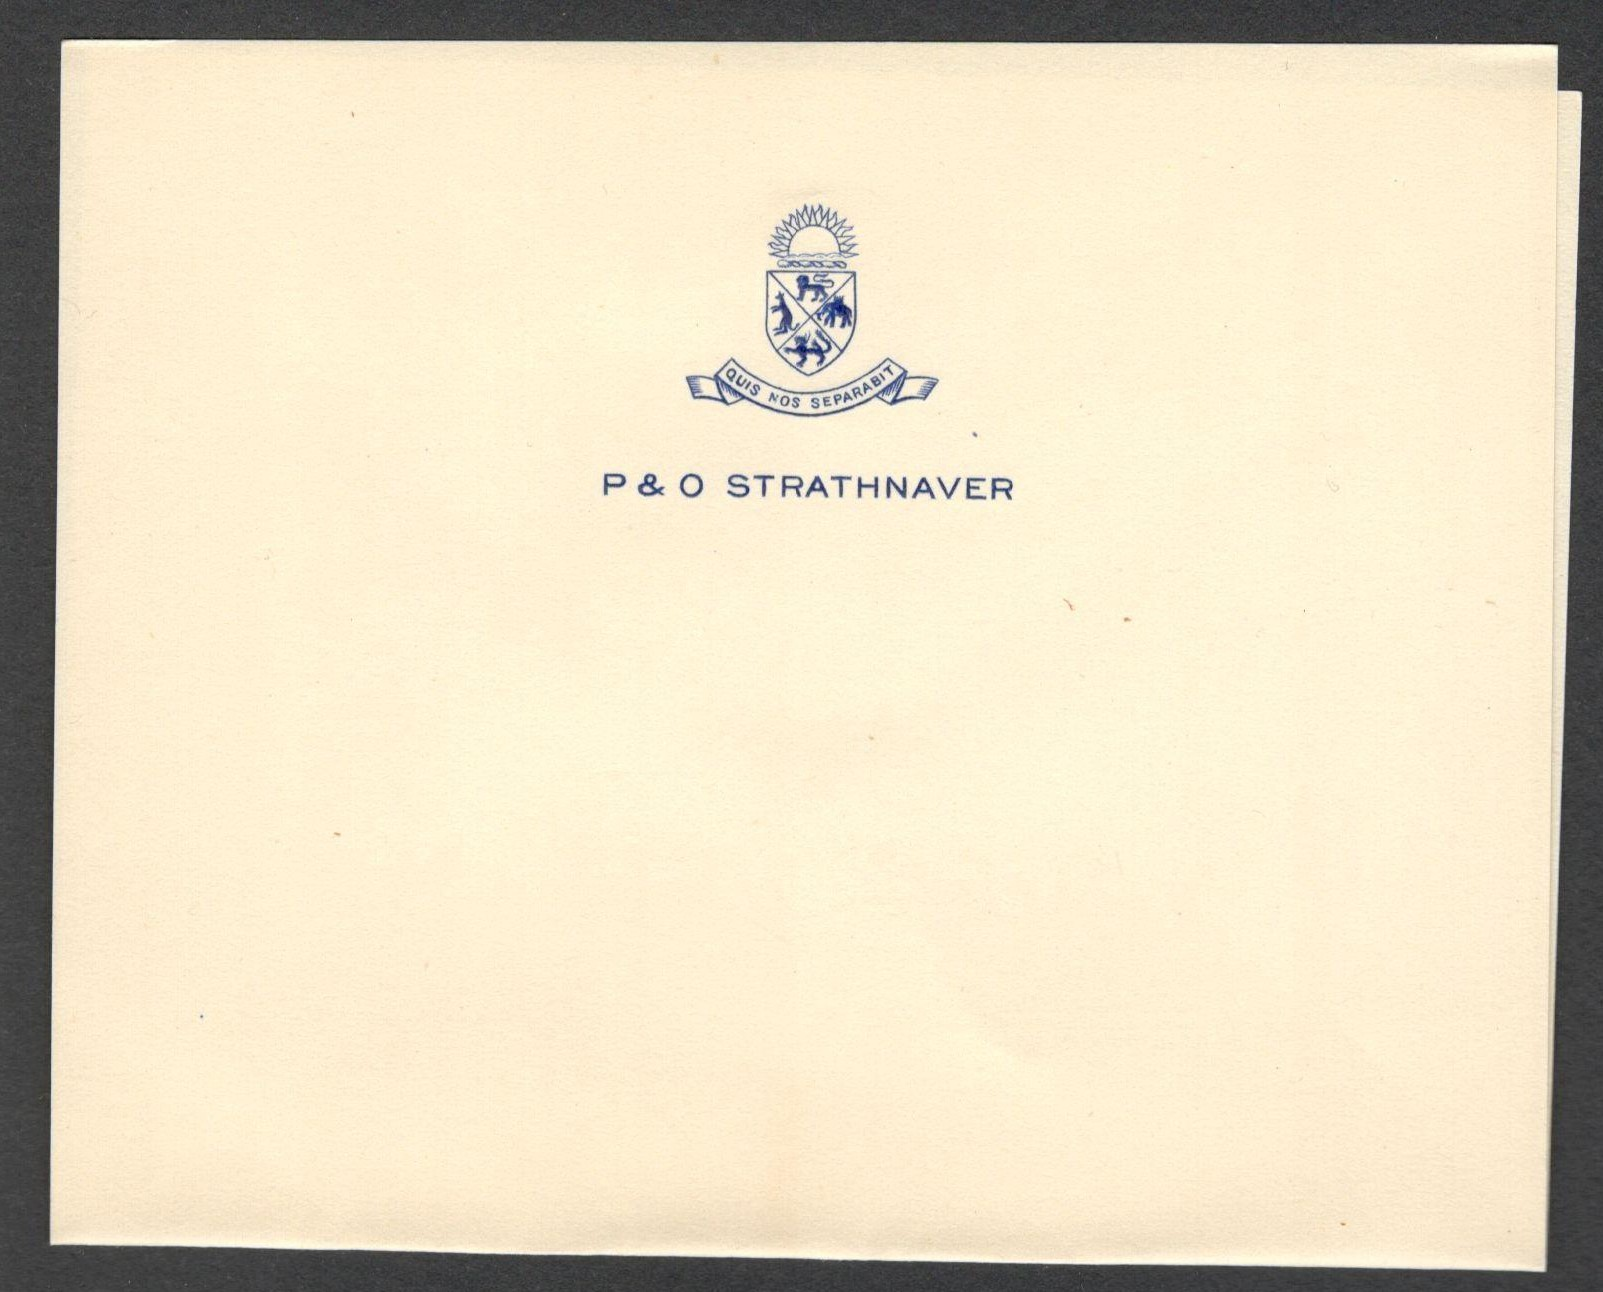 Lot 18 - P & O STEAM NAVIGATION COMPANY STRATHNAVER UNUSED WATERMARKED LETTERHEAD PAPER (FOLDED) & ENVELOPE